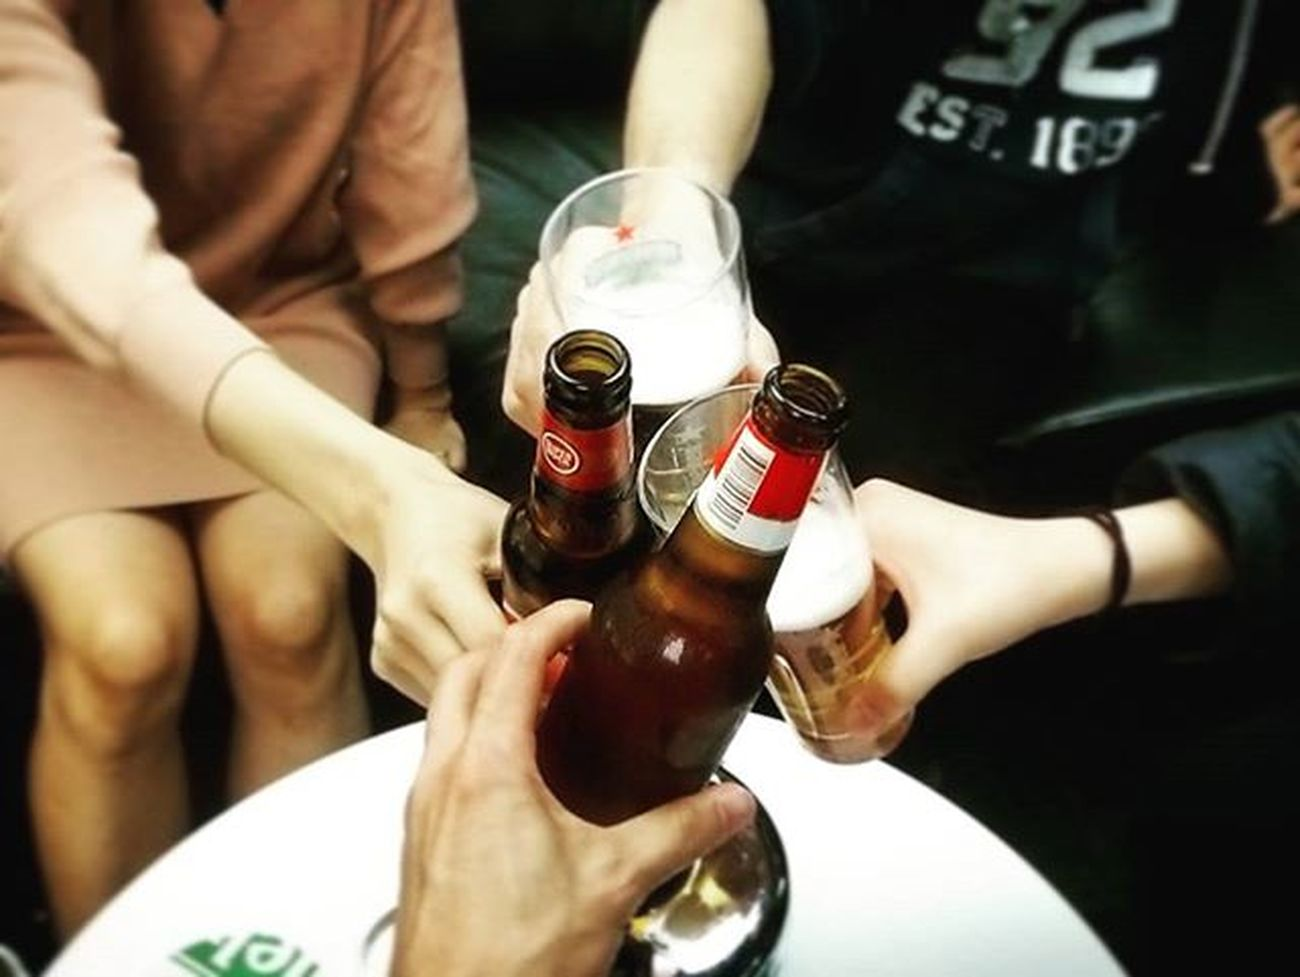 Cheers!! お疲れ! Enra Lisboa